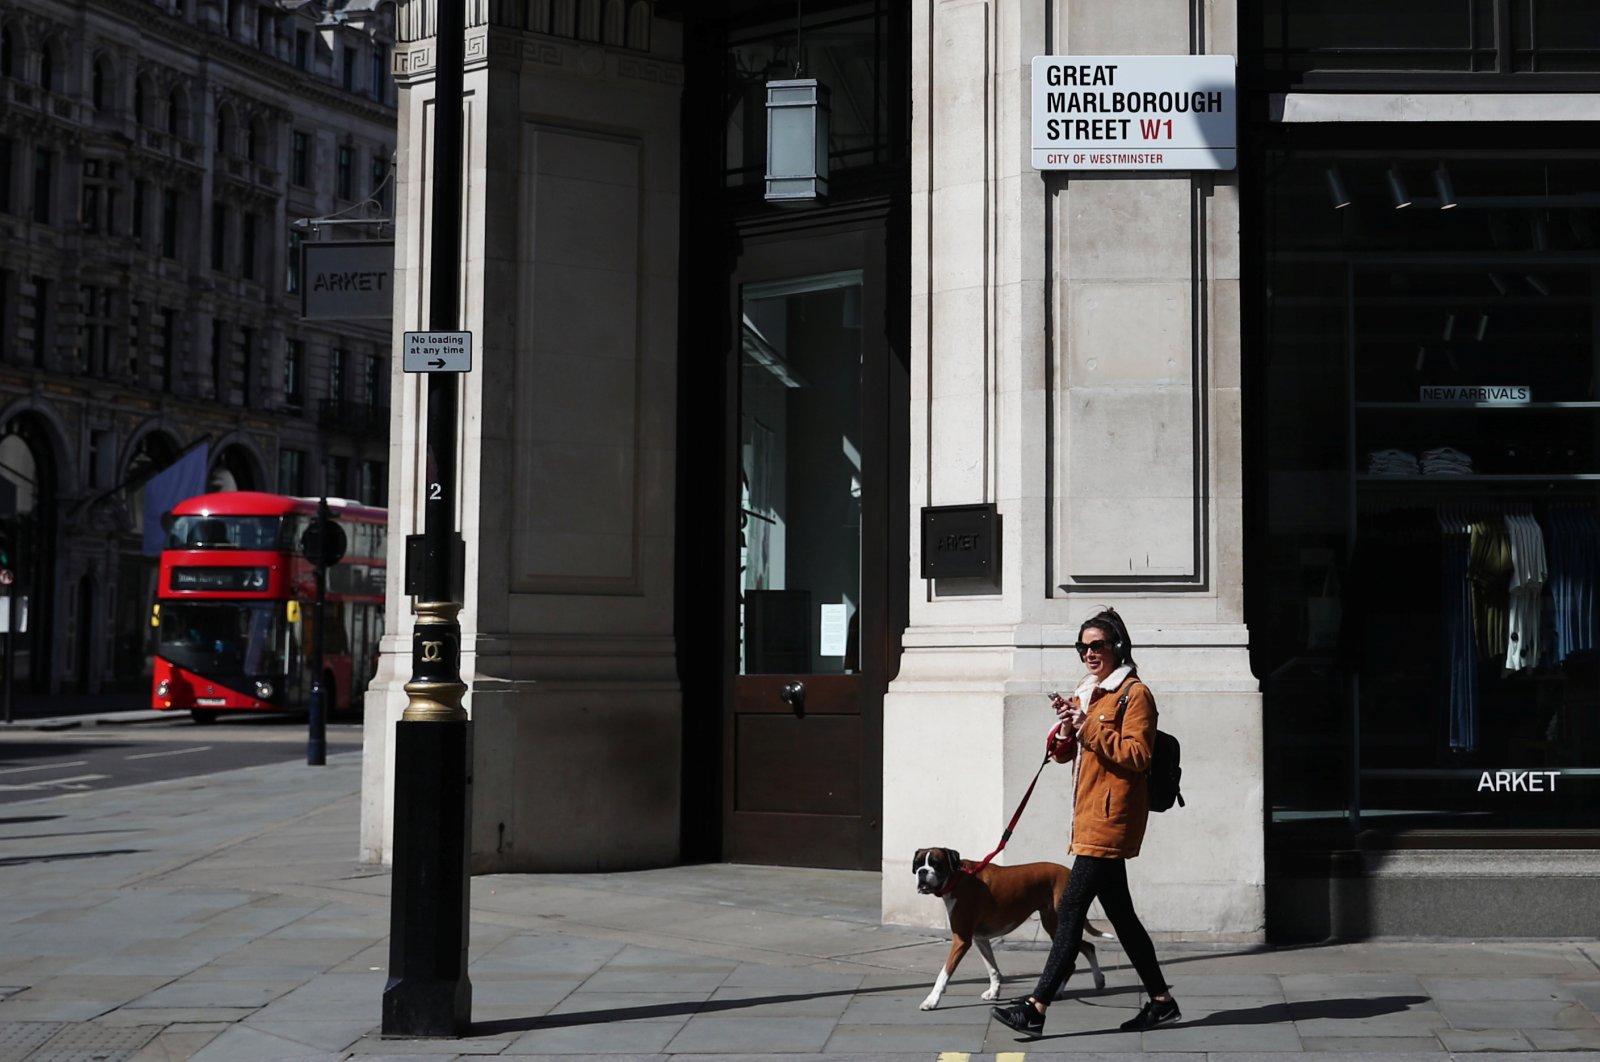 A woman walks her dog along Great Marlborough Street, London, April 13, 2020. (Reuters Photo)